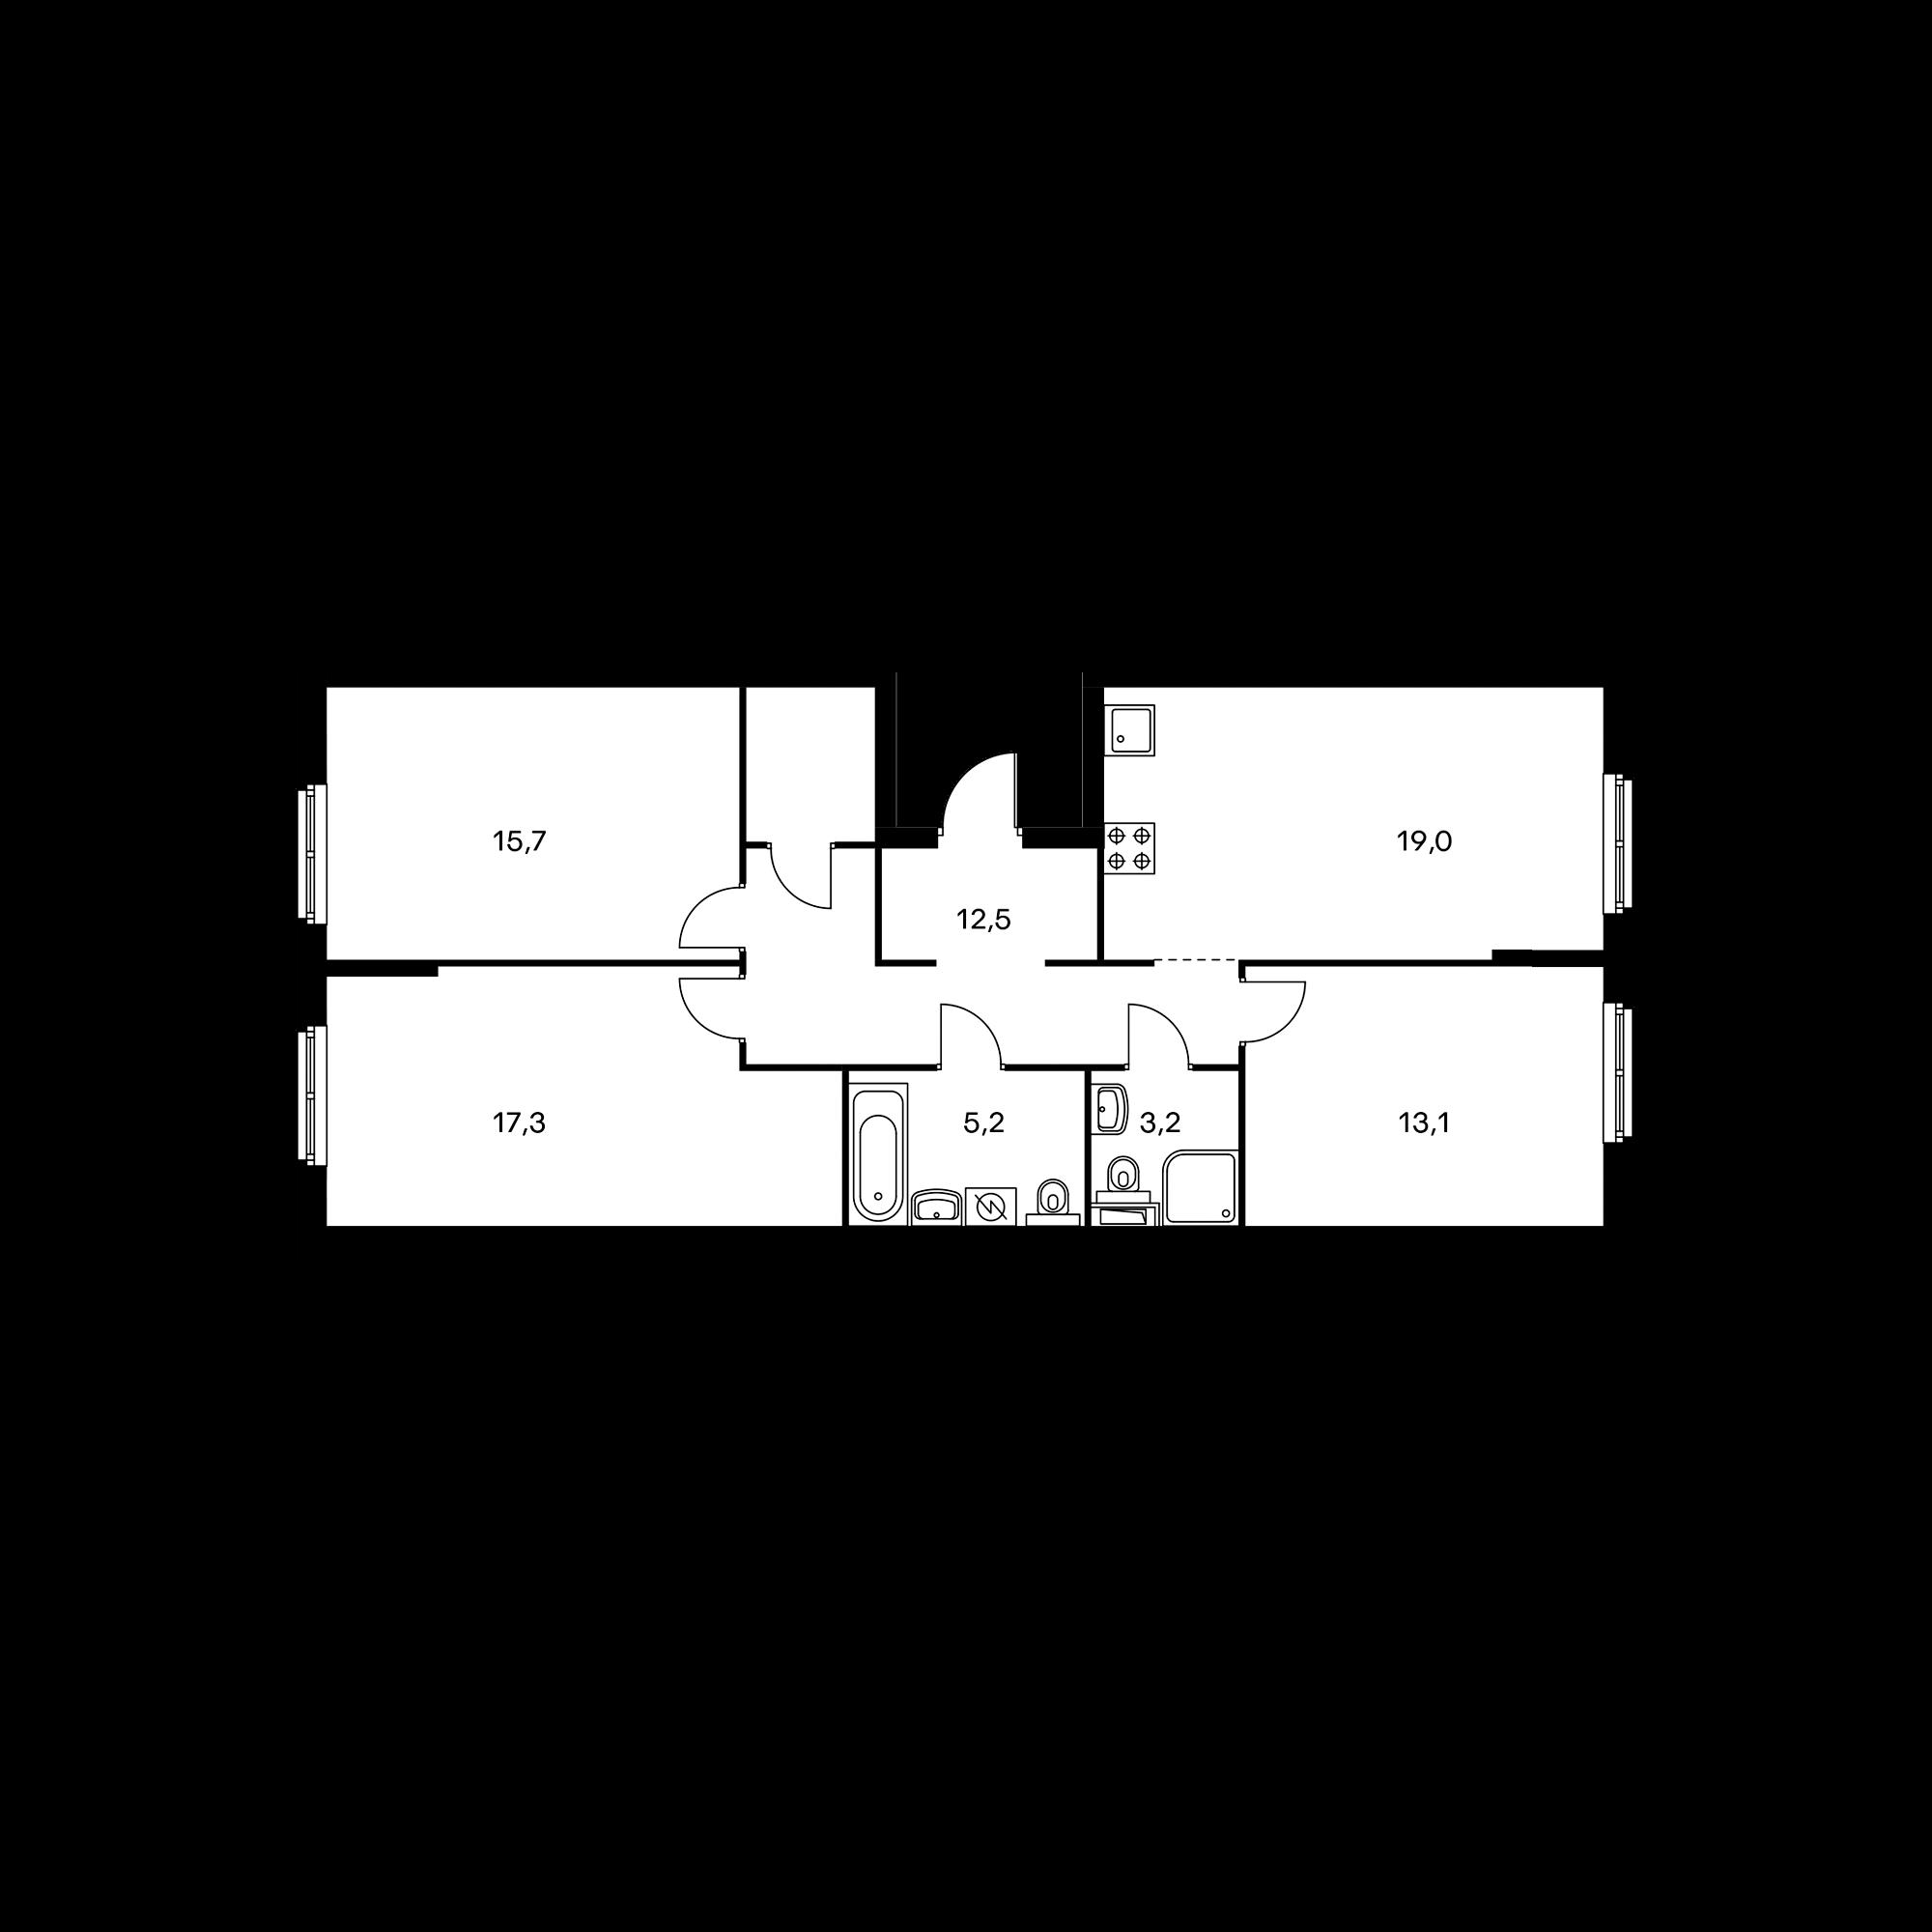 3EL5_6.6